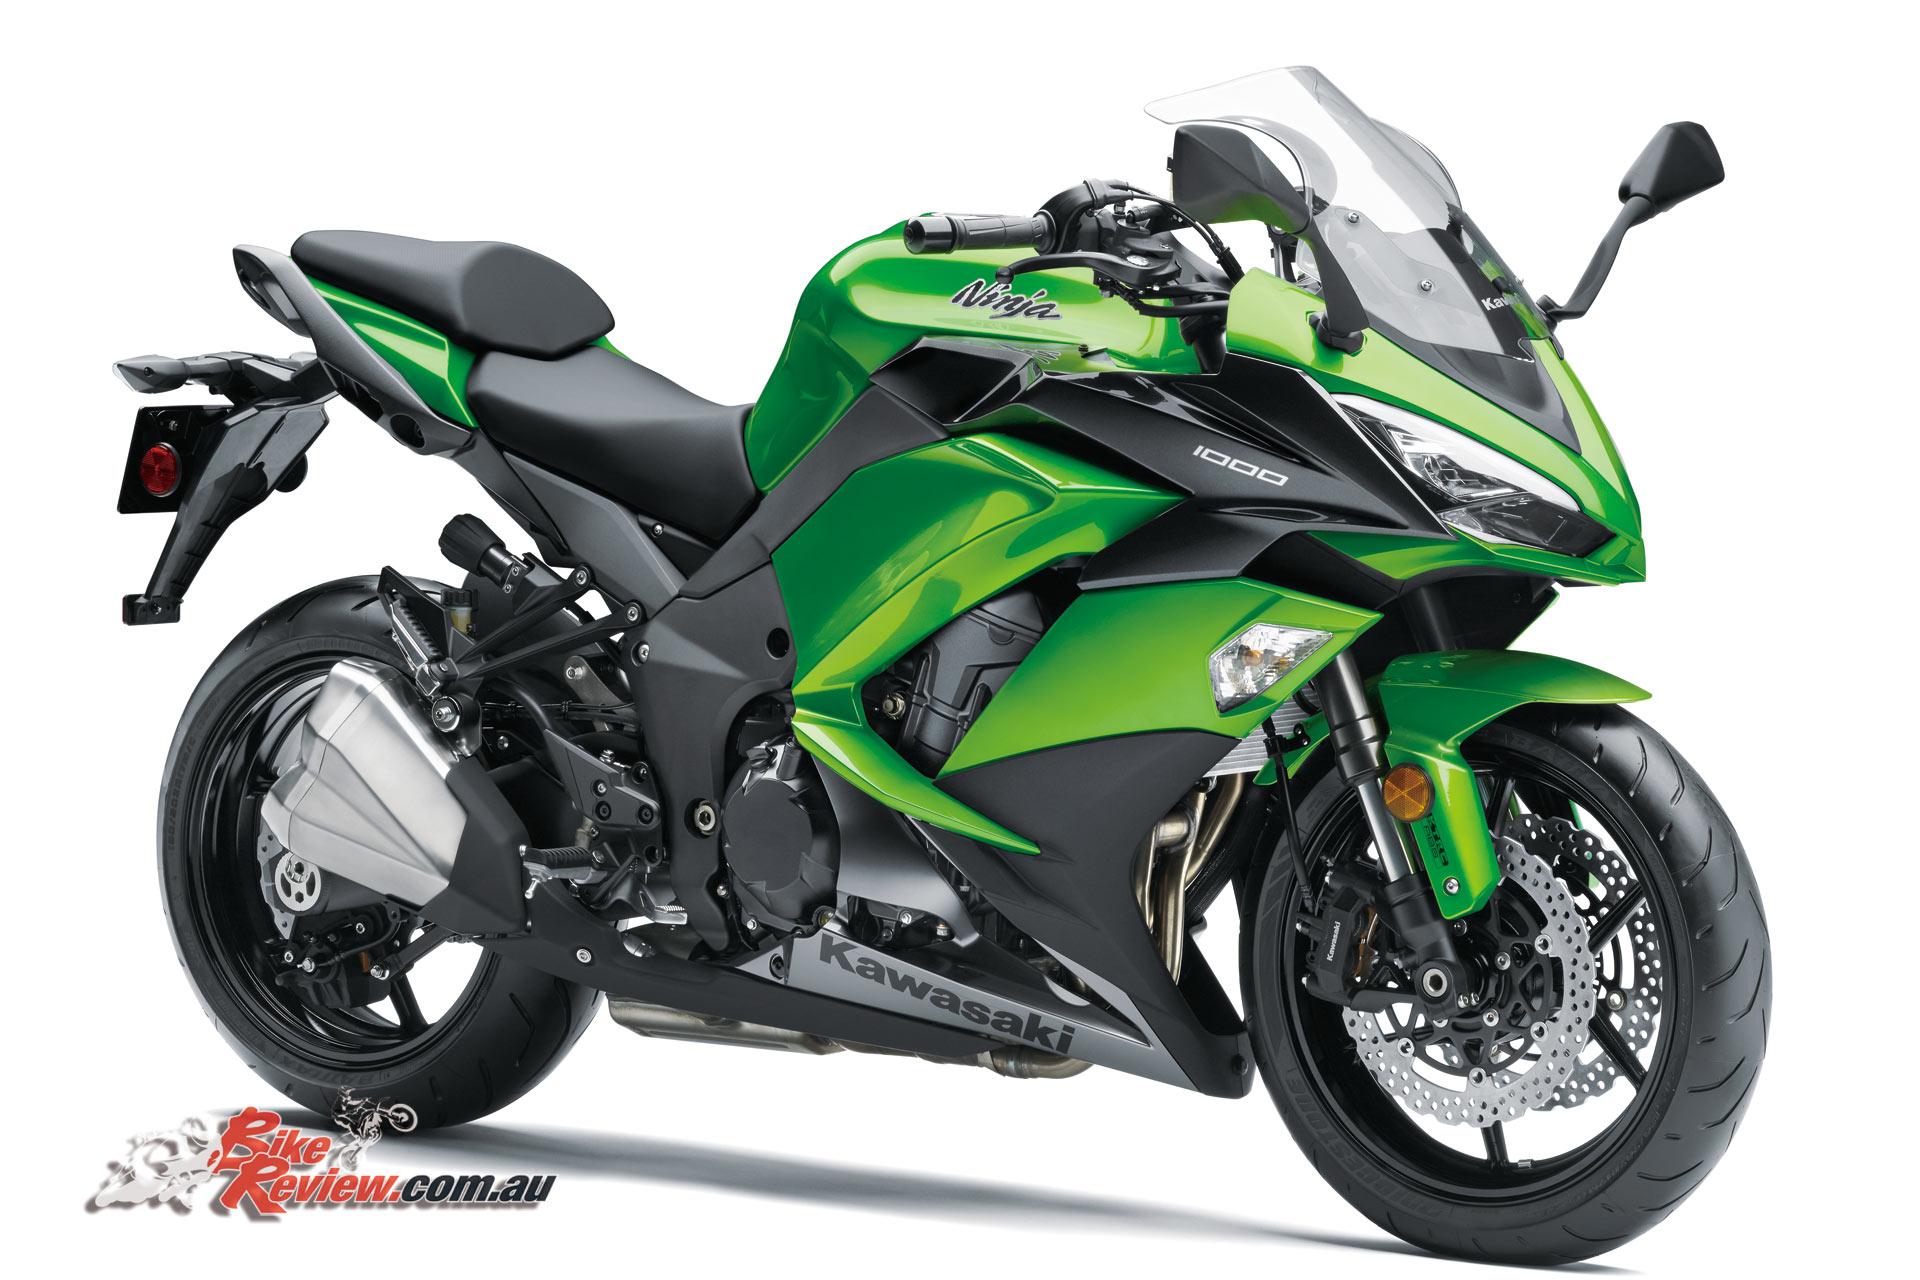 2017 Kawasaki Ninja 1000 - Updated - Bike Review